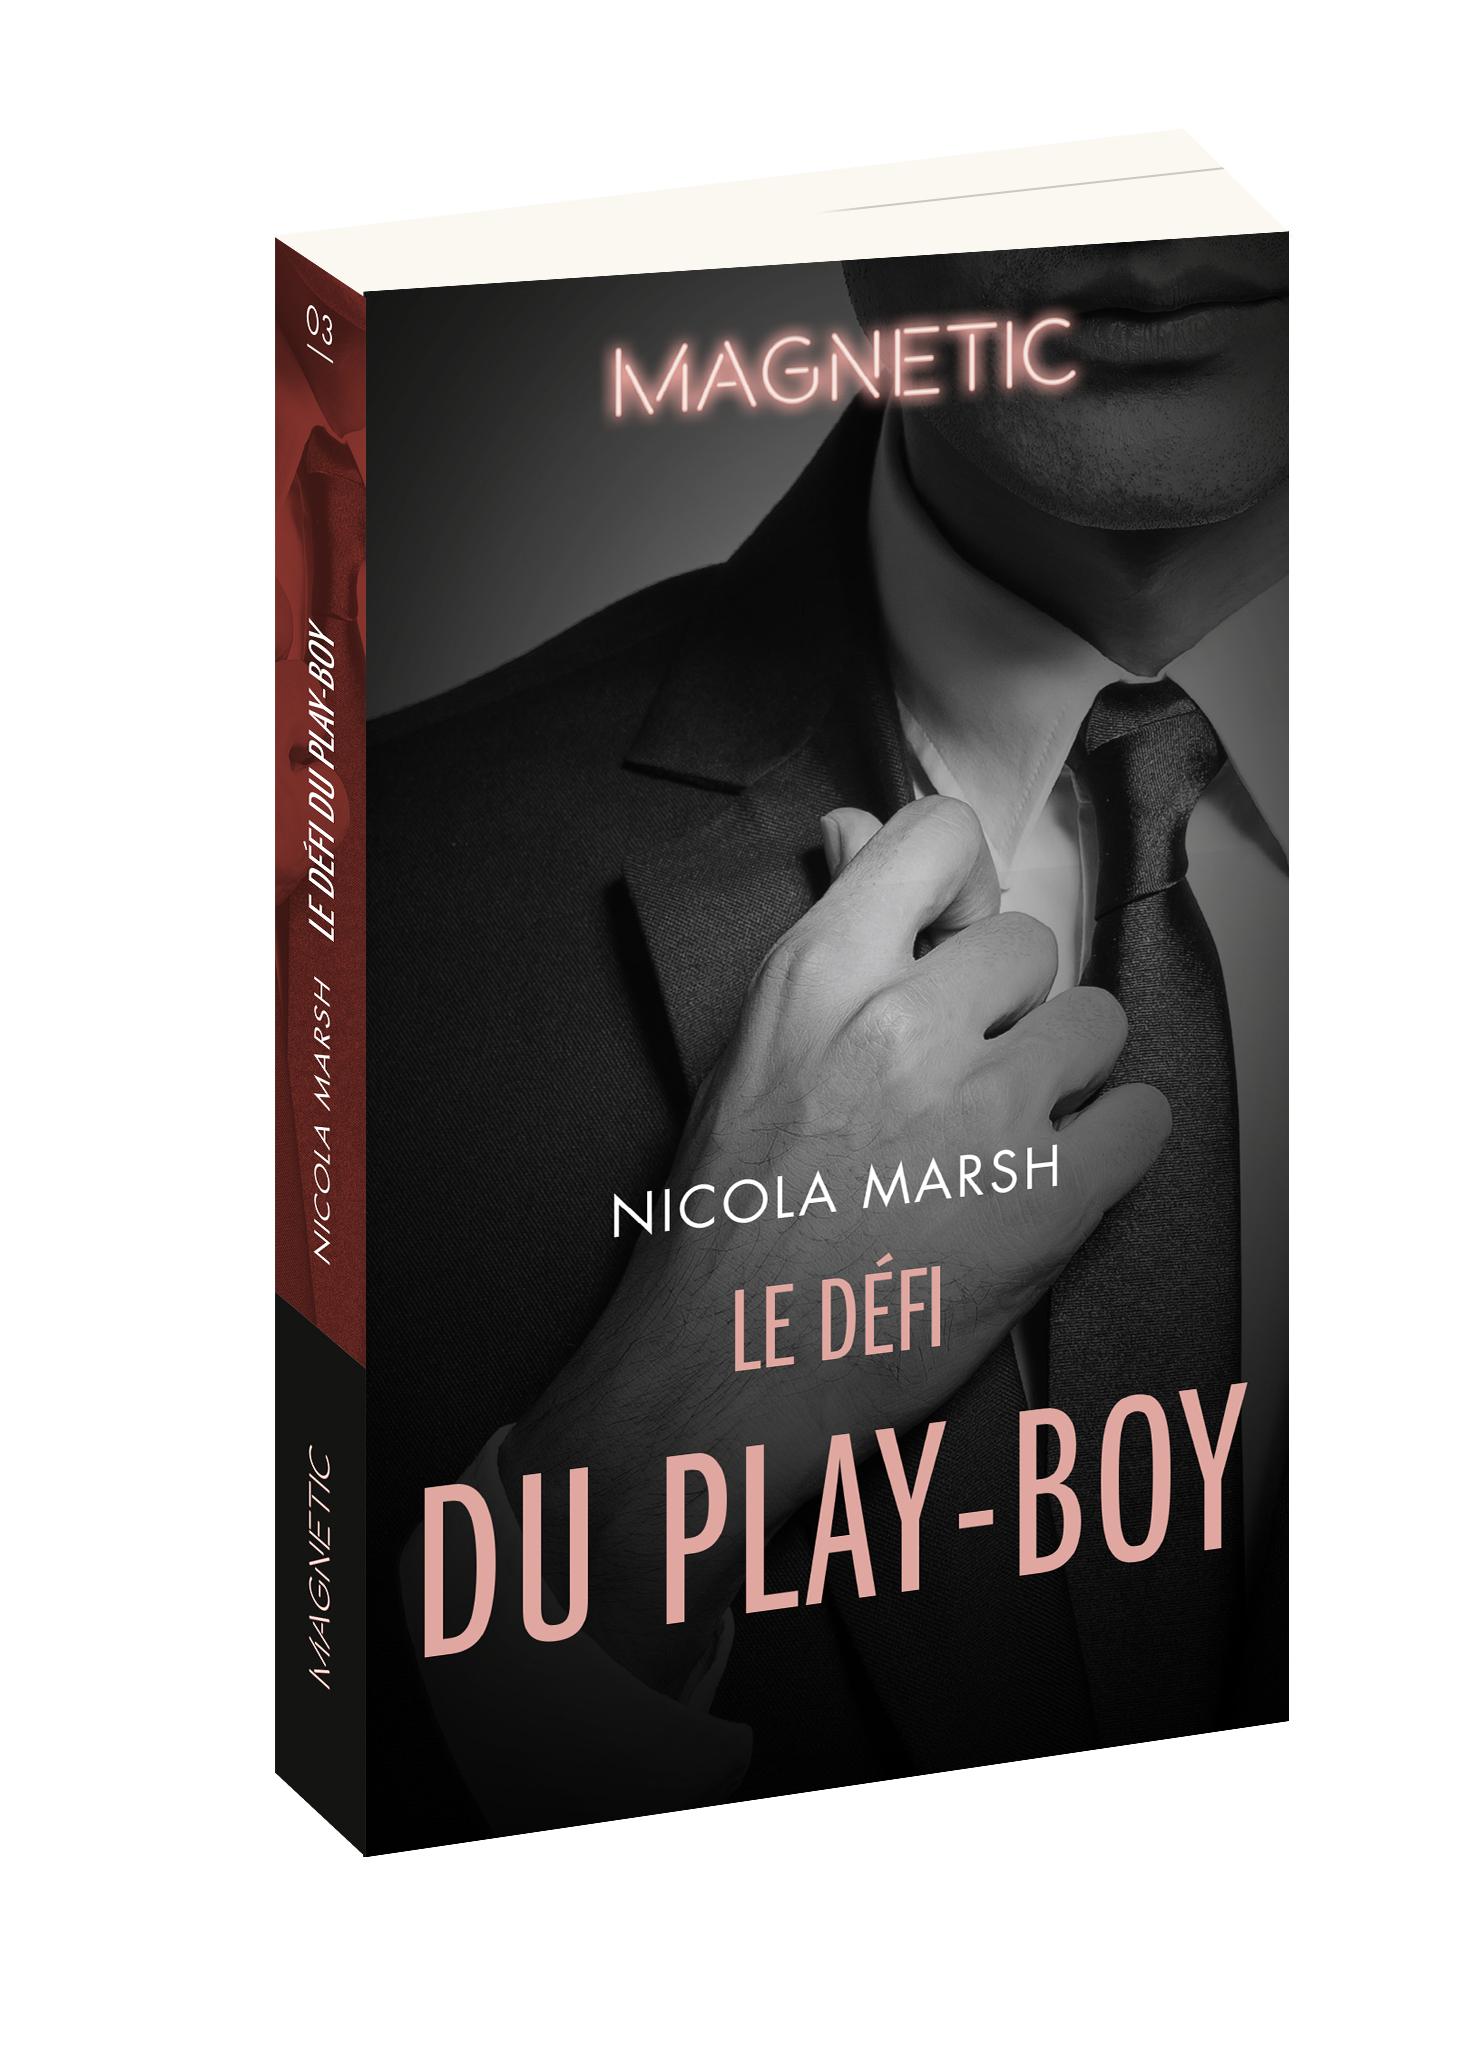 Le Défi du play-boy (Nicola Marsh)